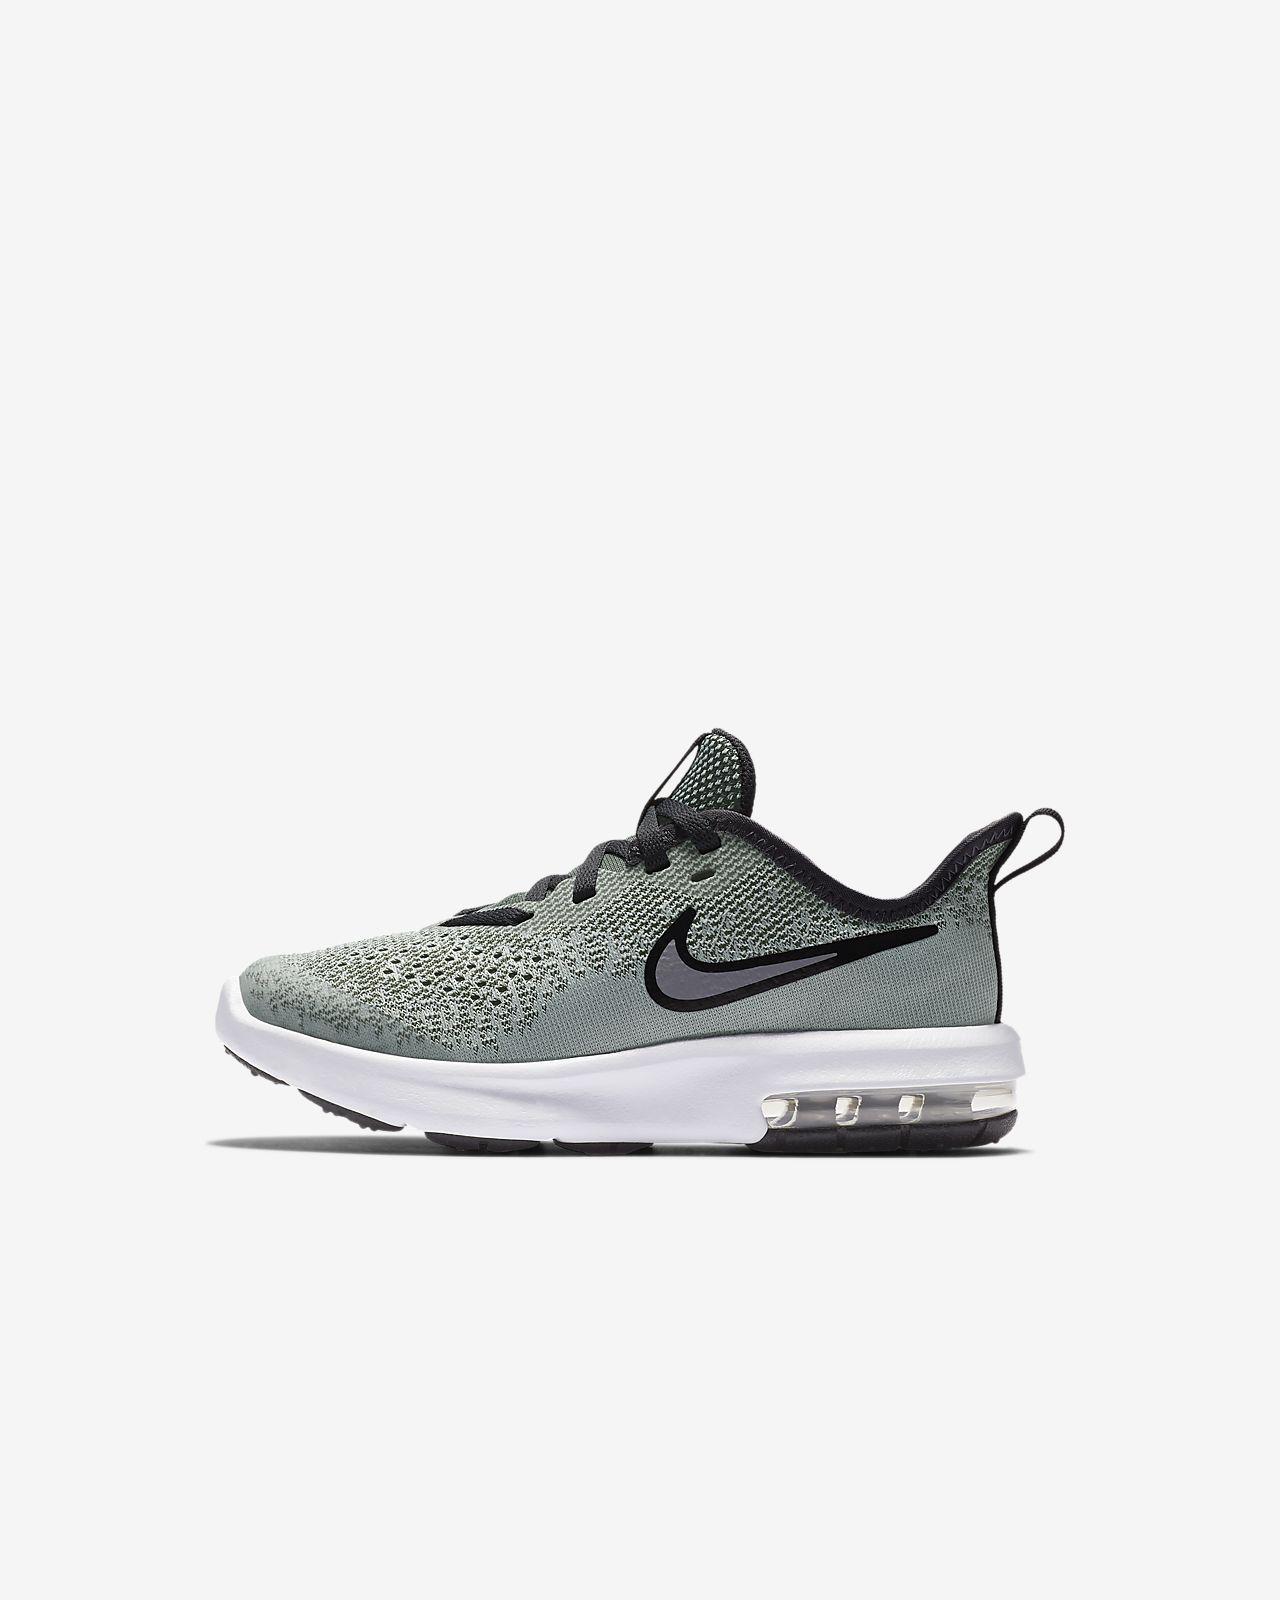 Sko Nike Air Max Sequent 4 för barn